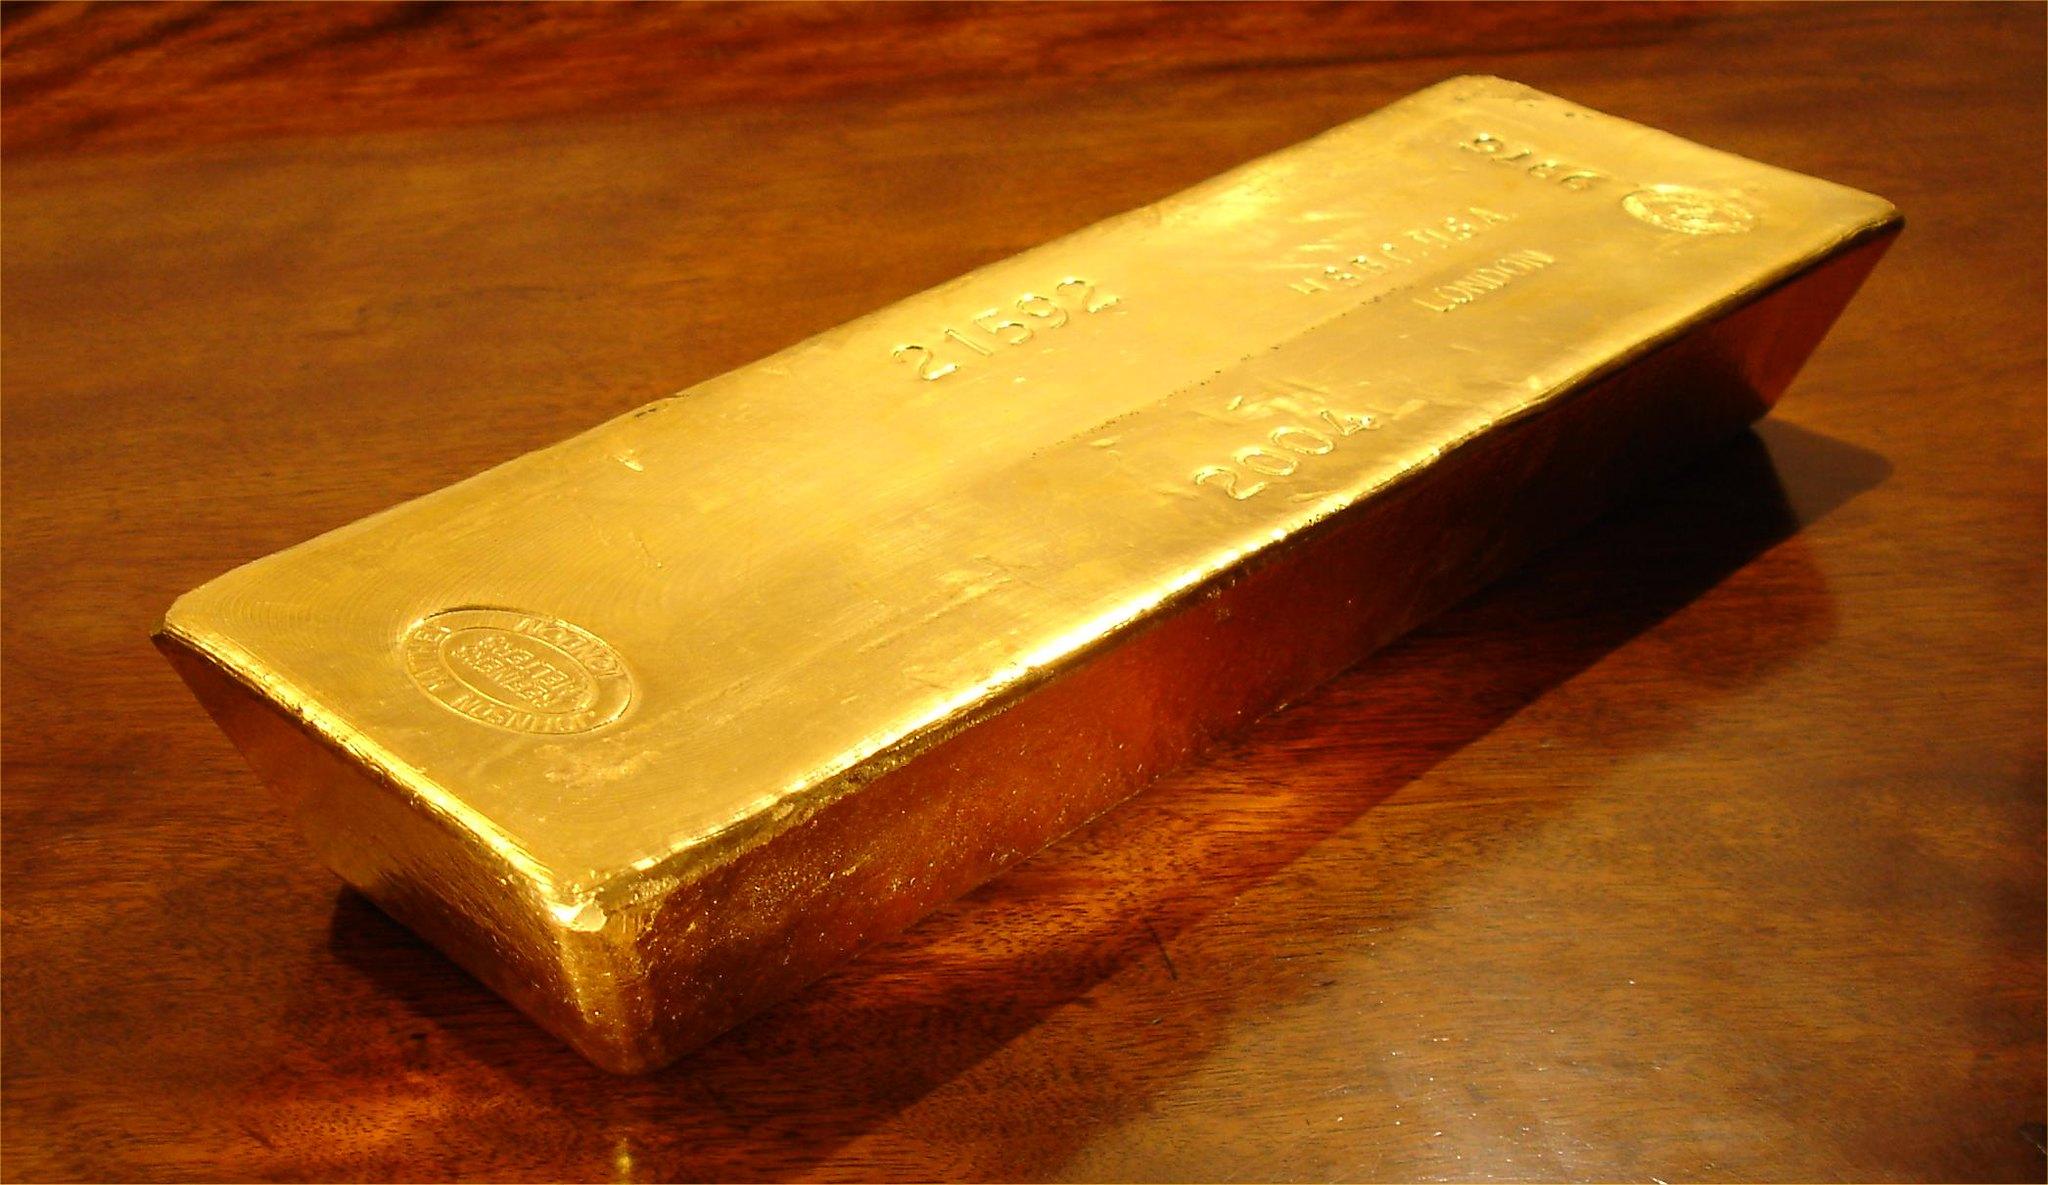 major gold smuggling hub